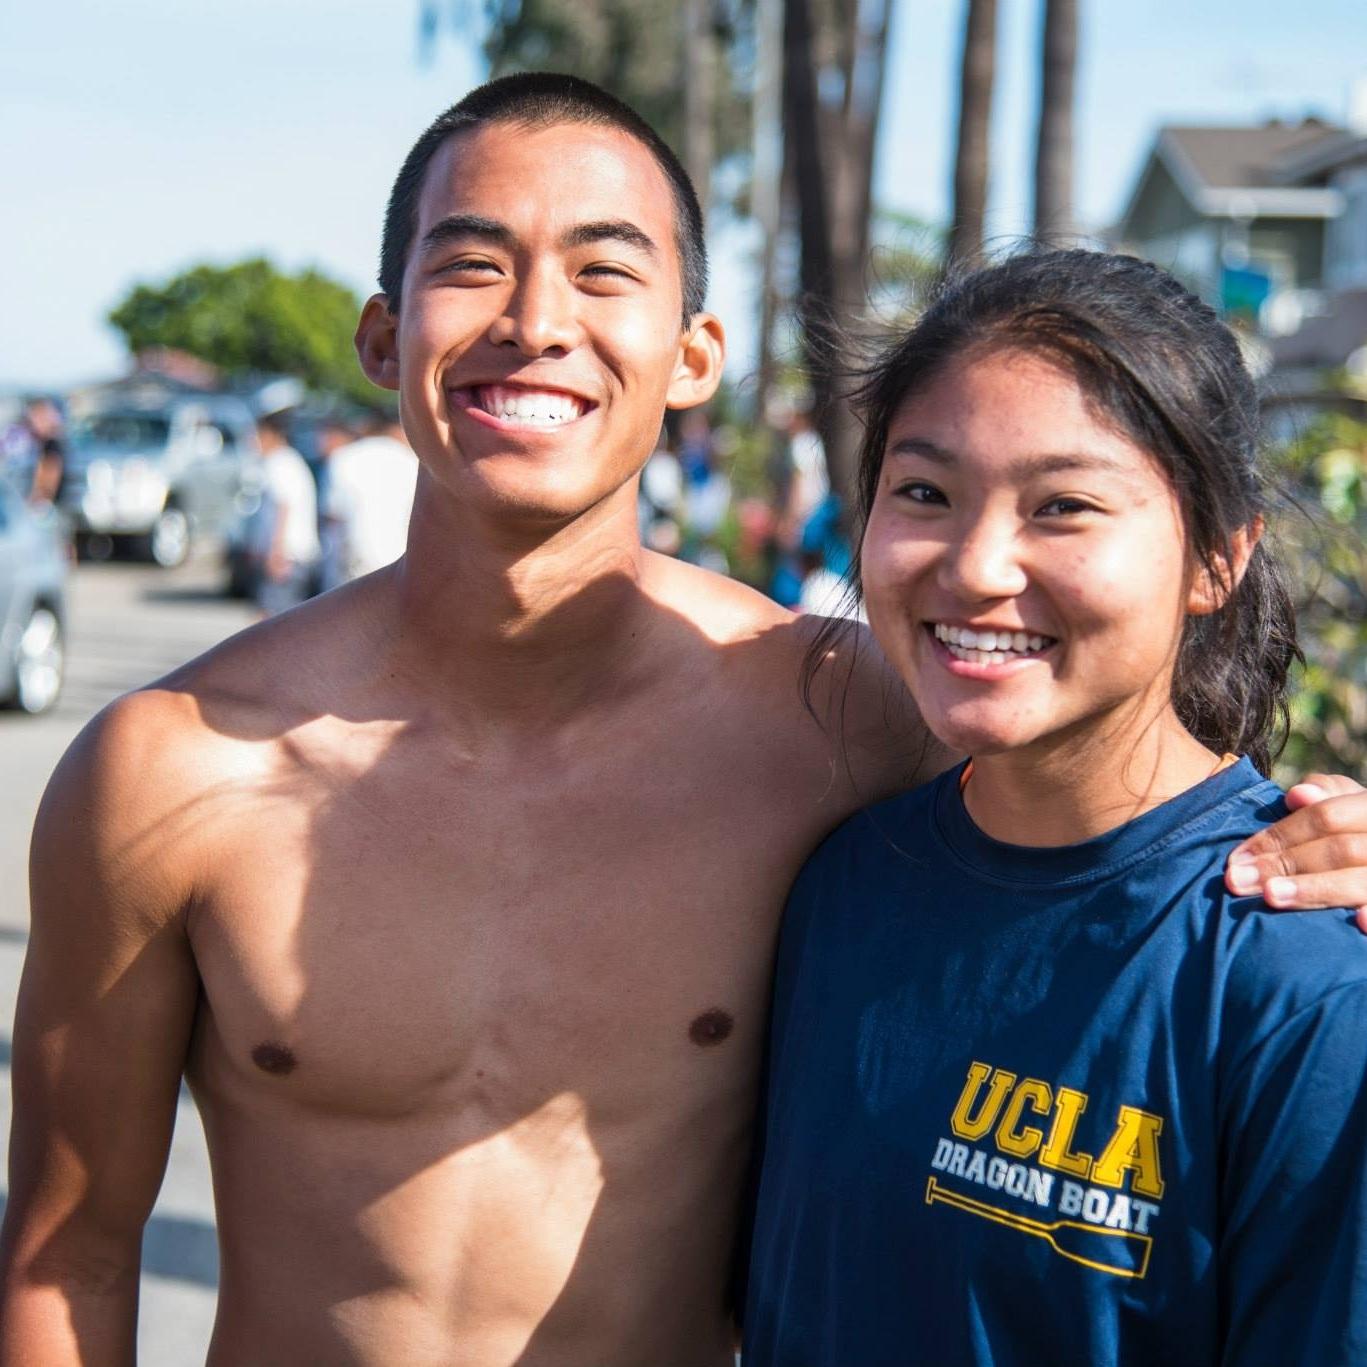 Long Beach Dragon Boat Race - 2015 (Kristie Won)